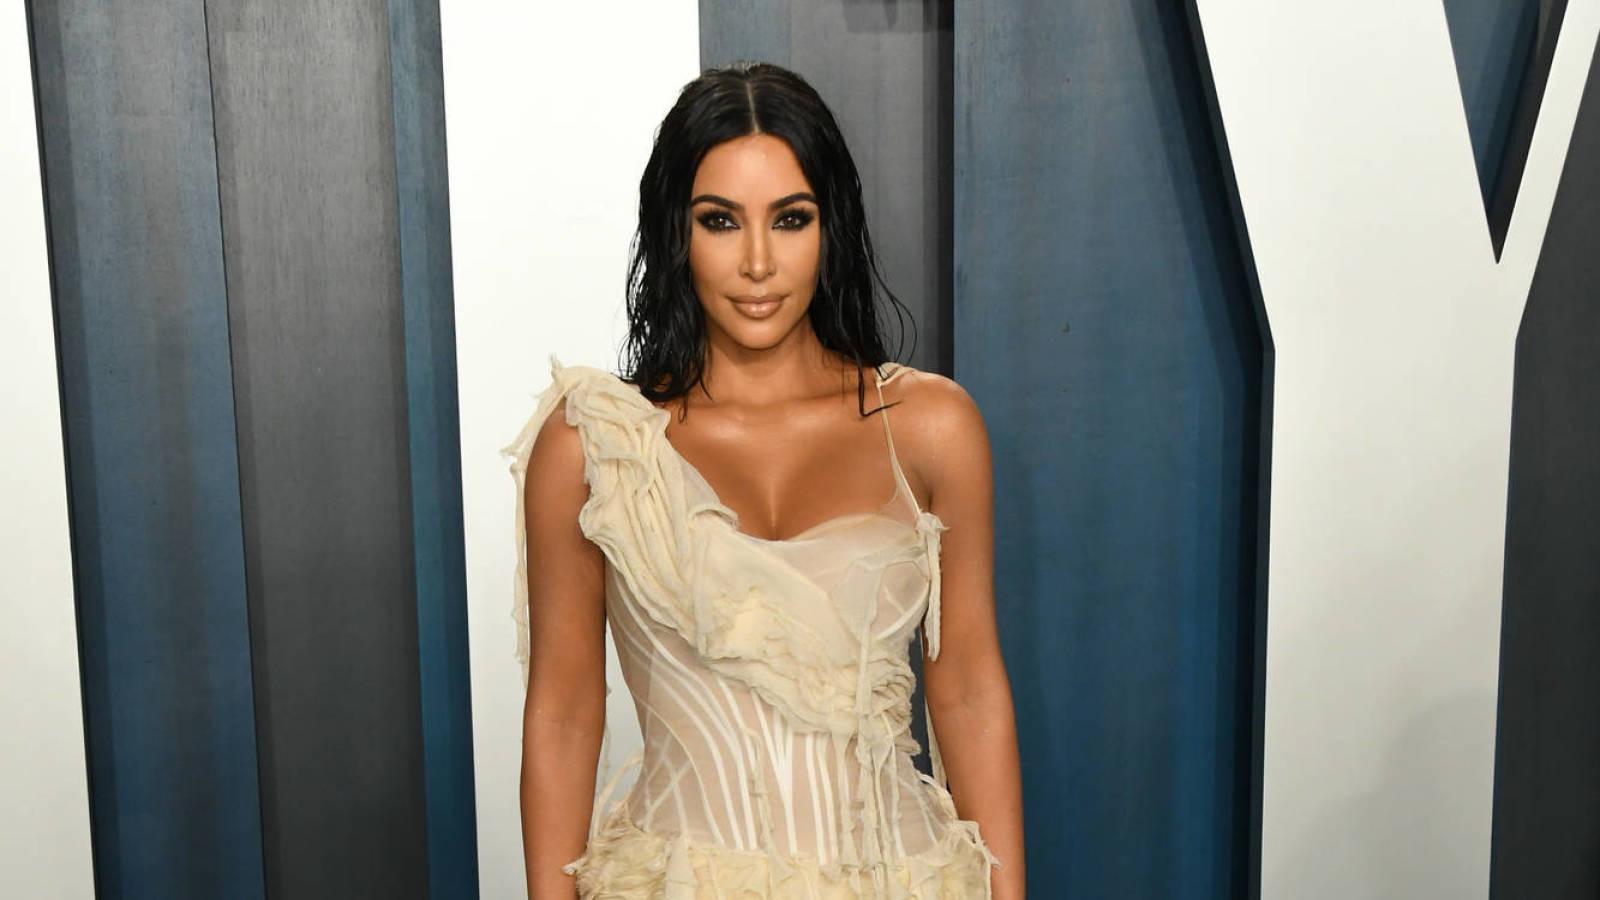 Kim Kardashian West has officially hit billionaire status | Yardbarker